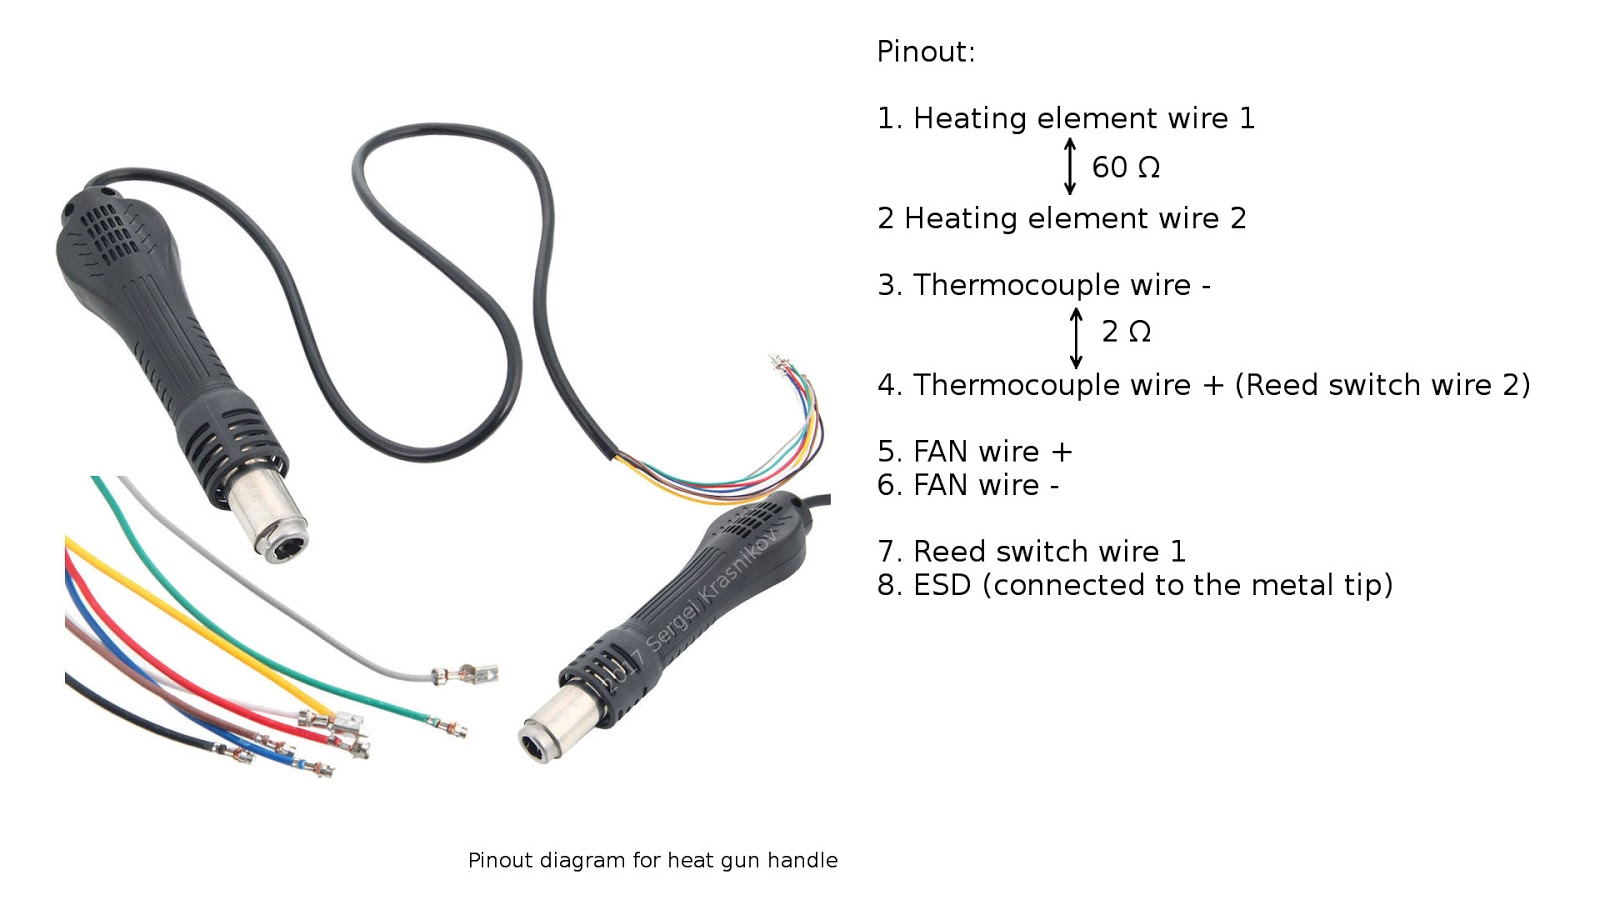 soldering iron wiring diagram thermo king evolution apu electrolab diy de station for 25